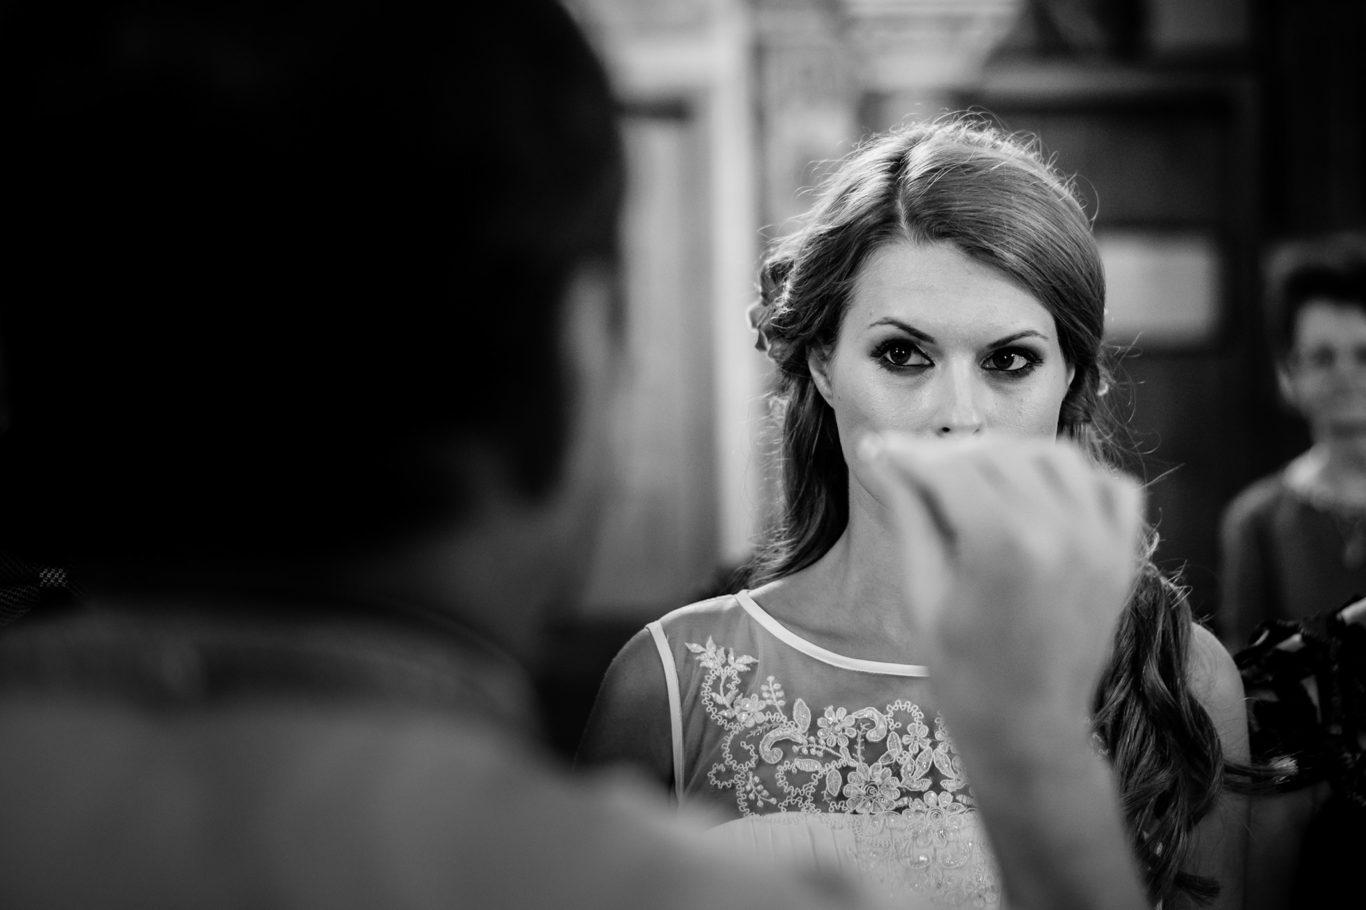 0335-fotografie-nunta-bucuresti-rodica-rares-fotograf-ciprian-dumitrescu-dsc_2556